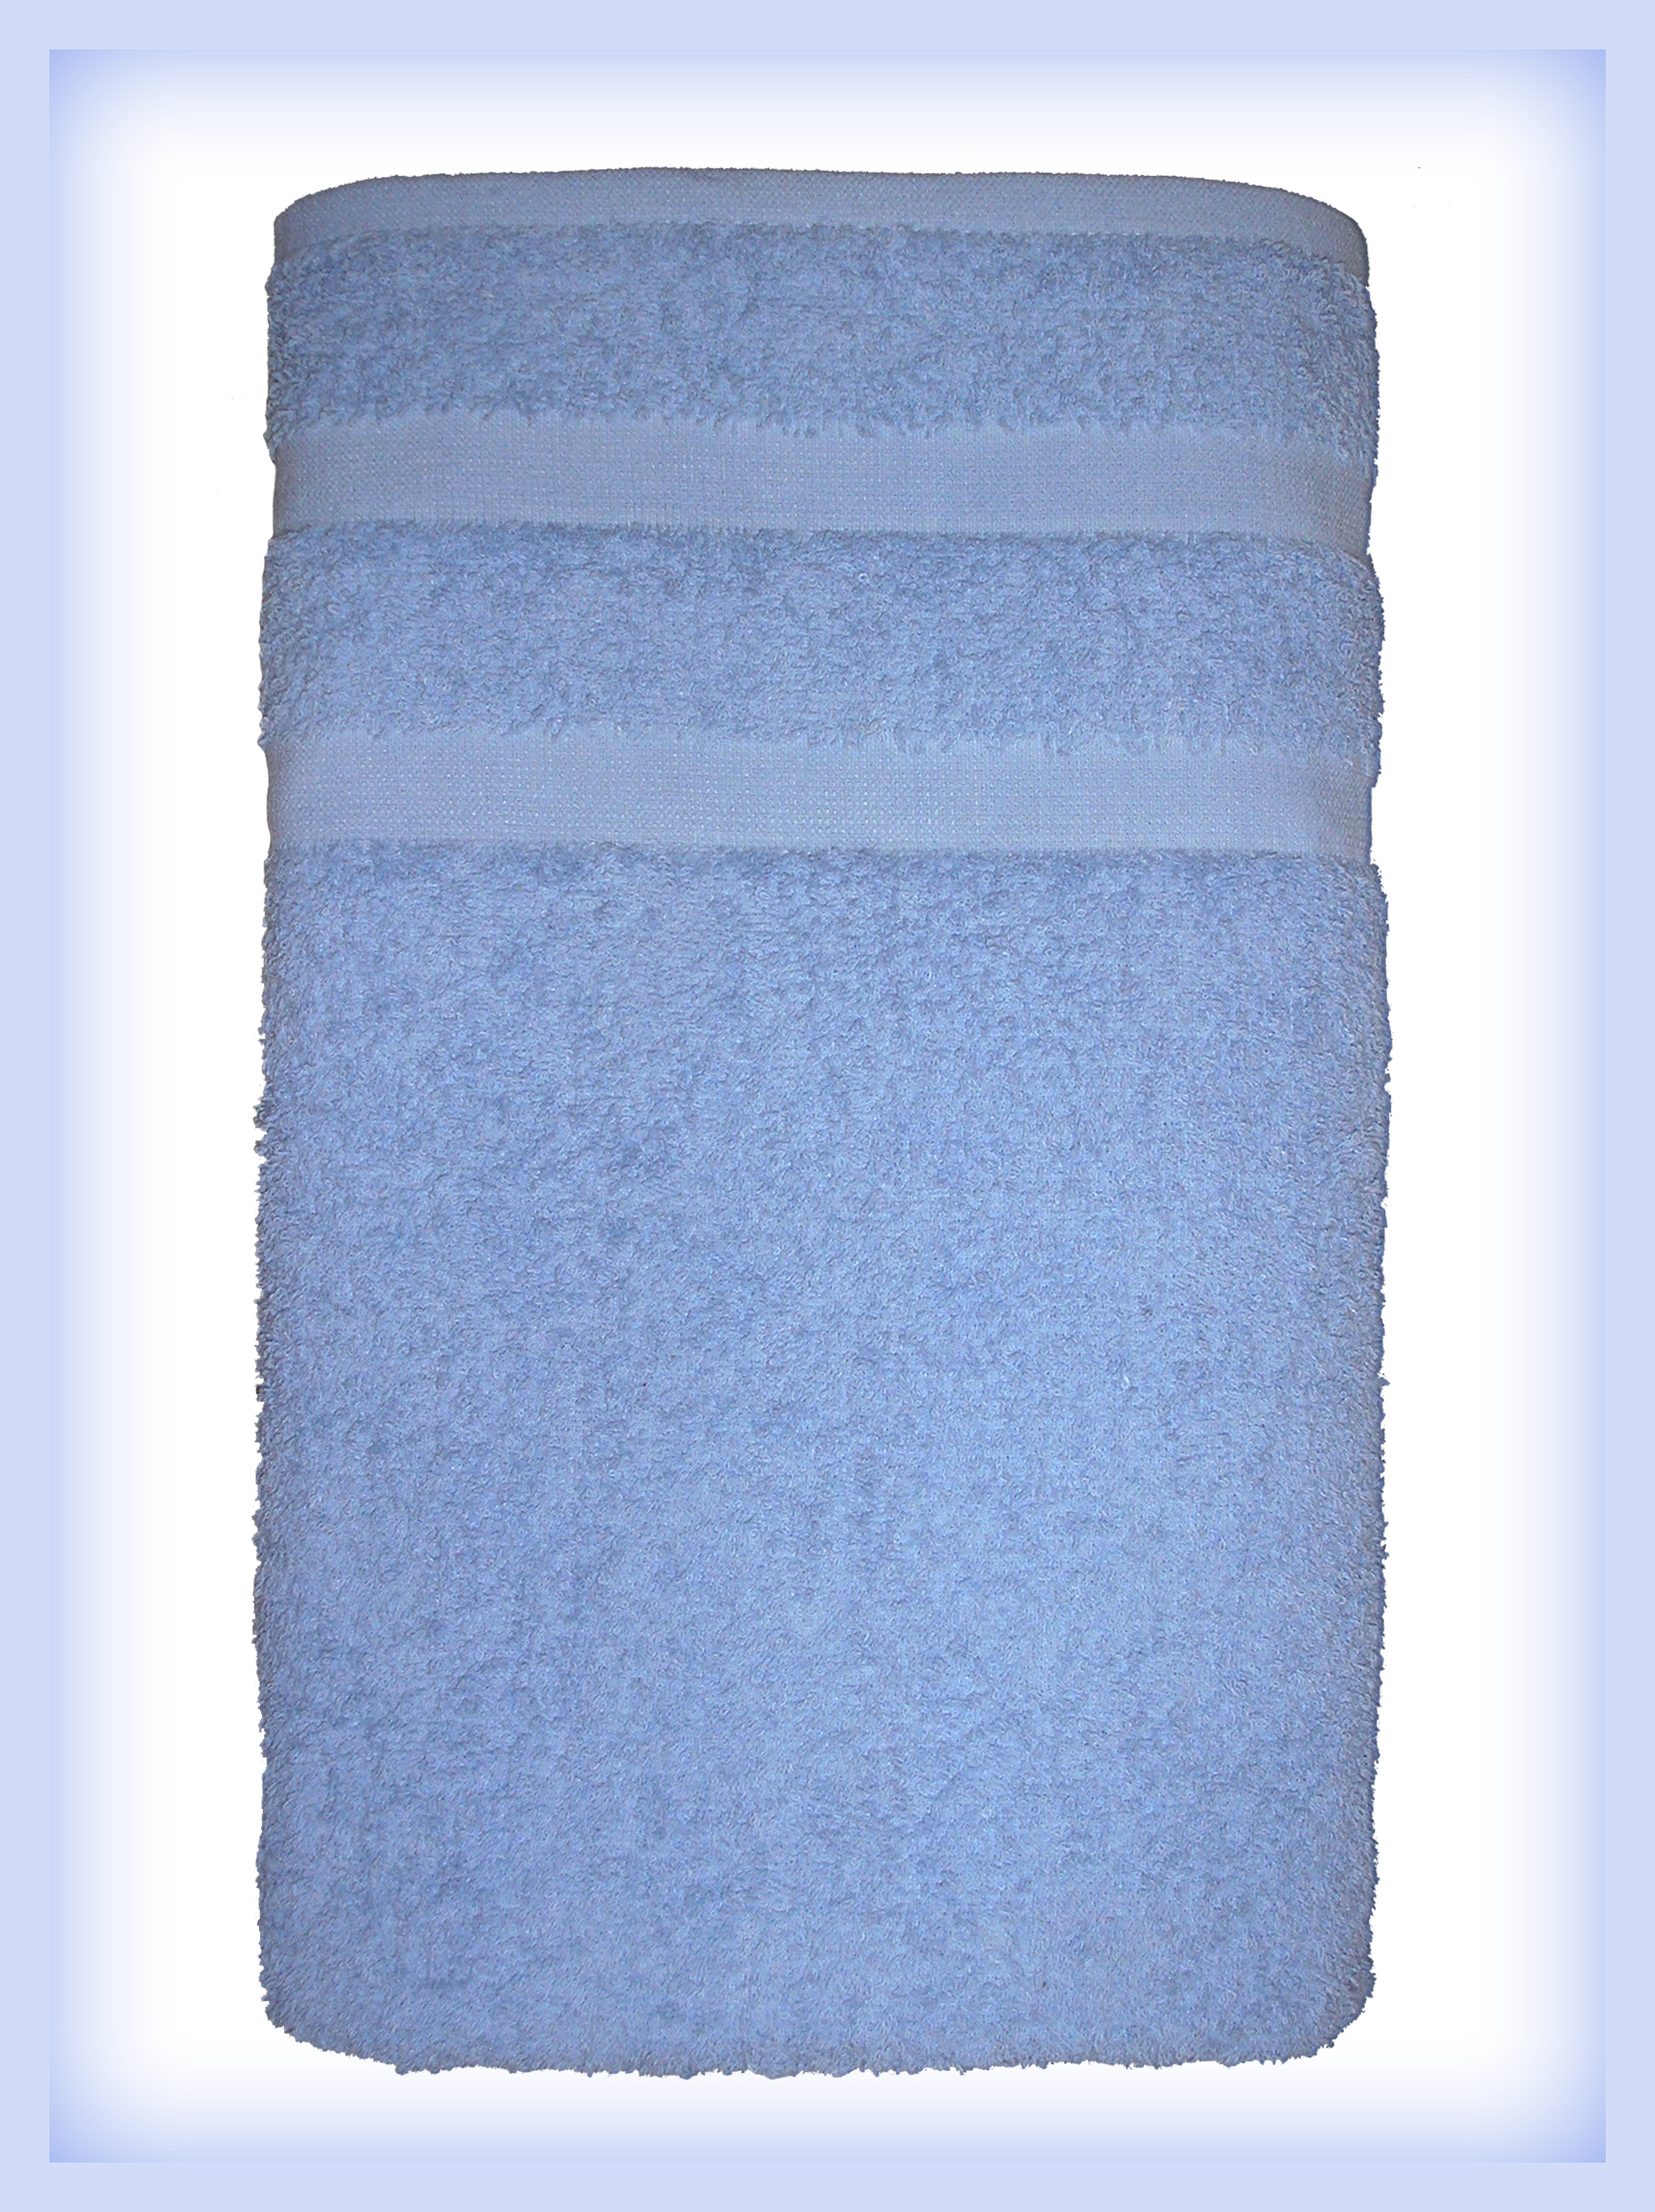 luxury towels, beach towels, bath towels,